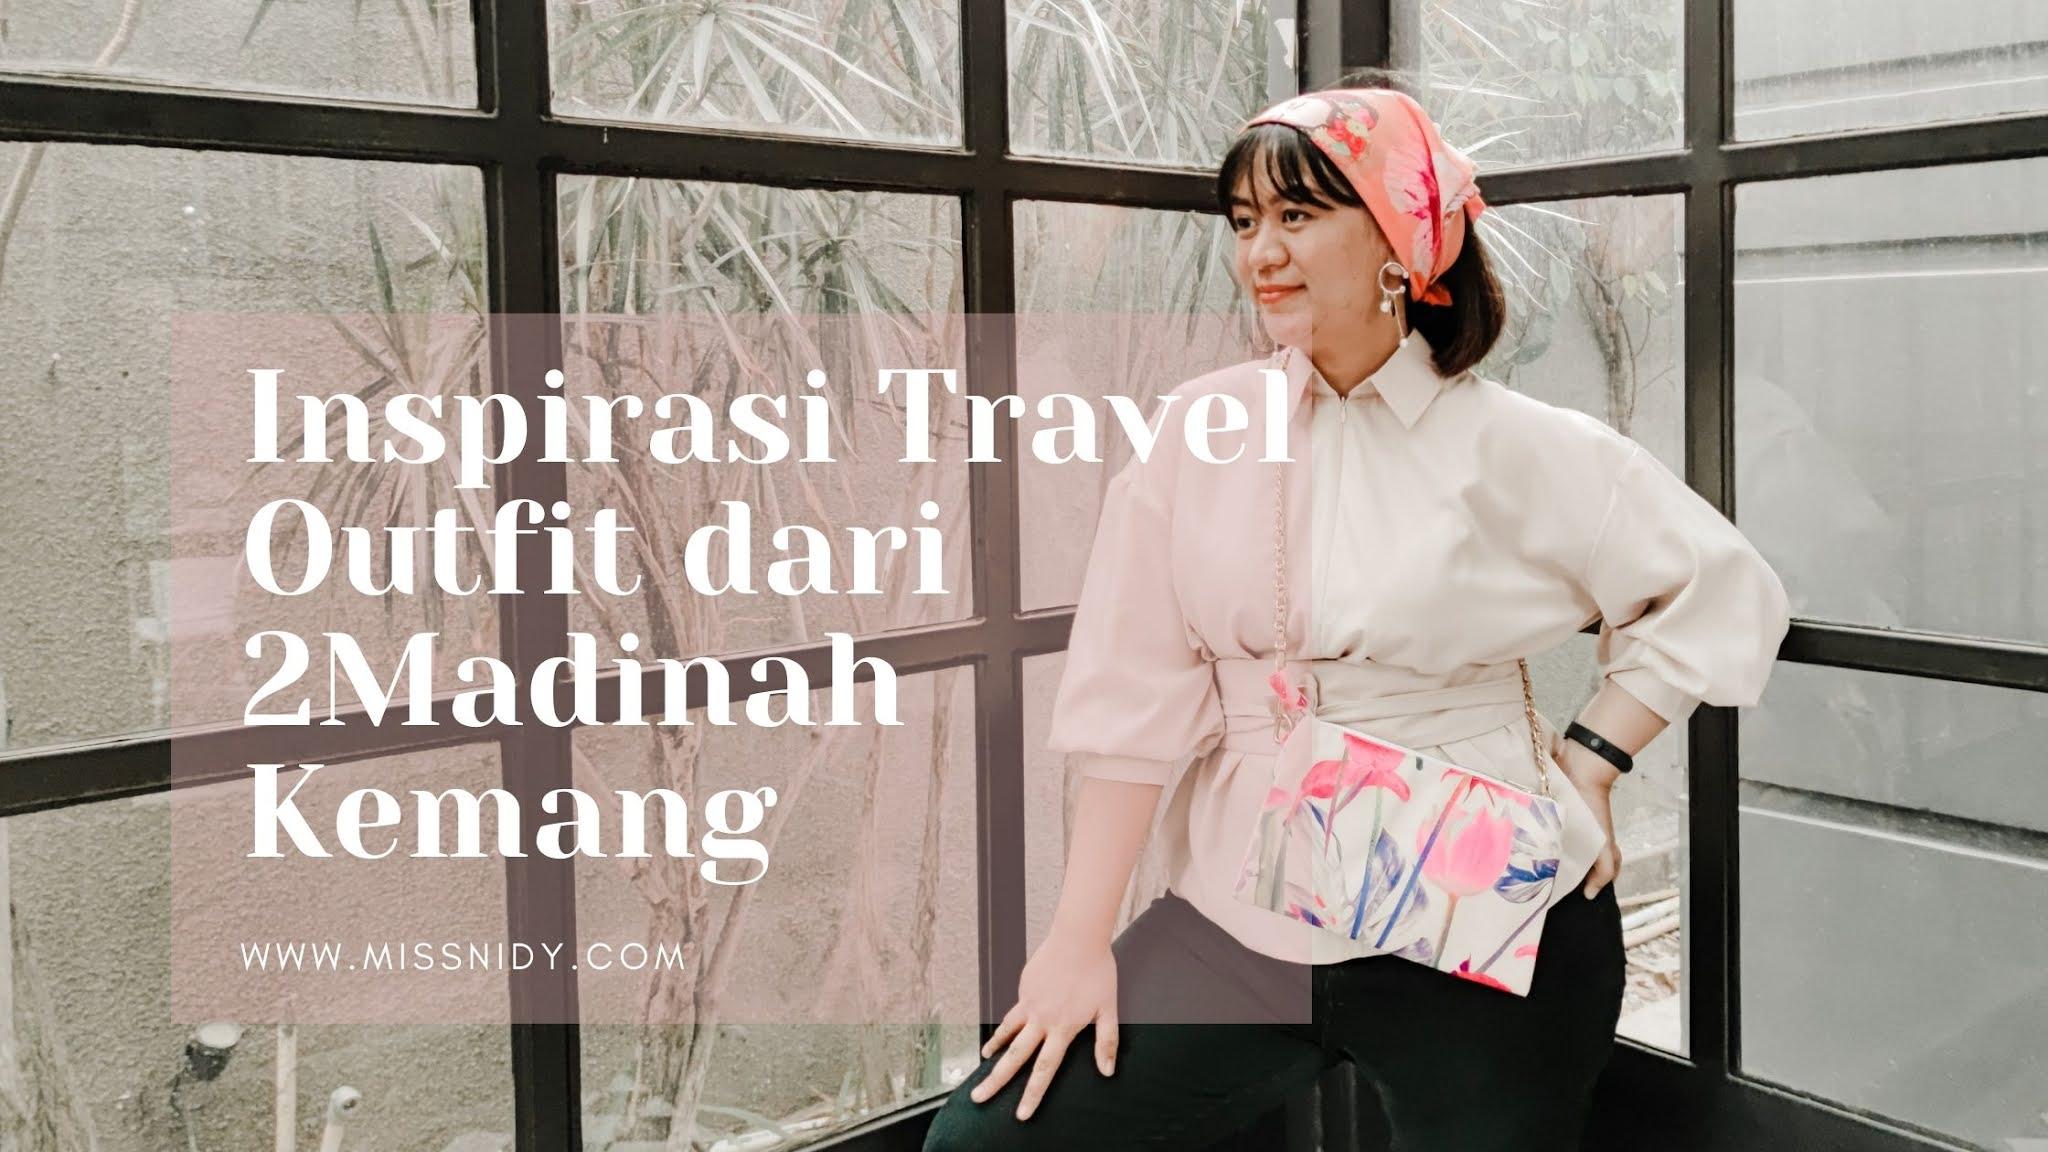 inspirasi travel outfit dari 2madinah kemang